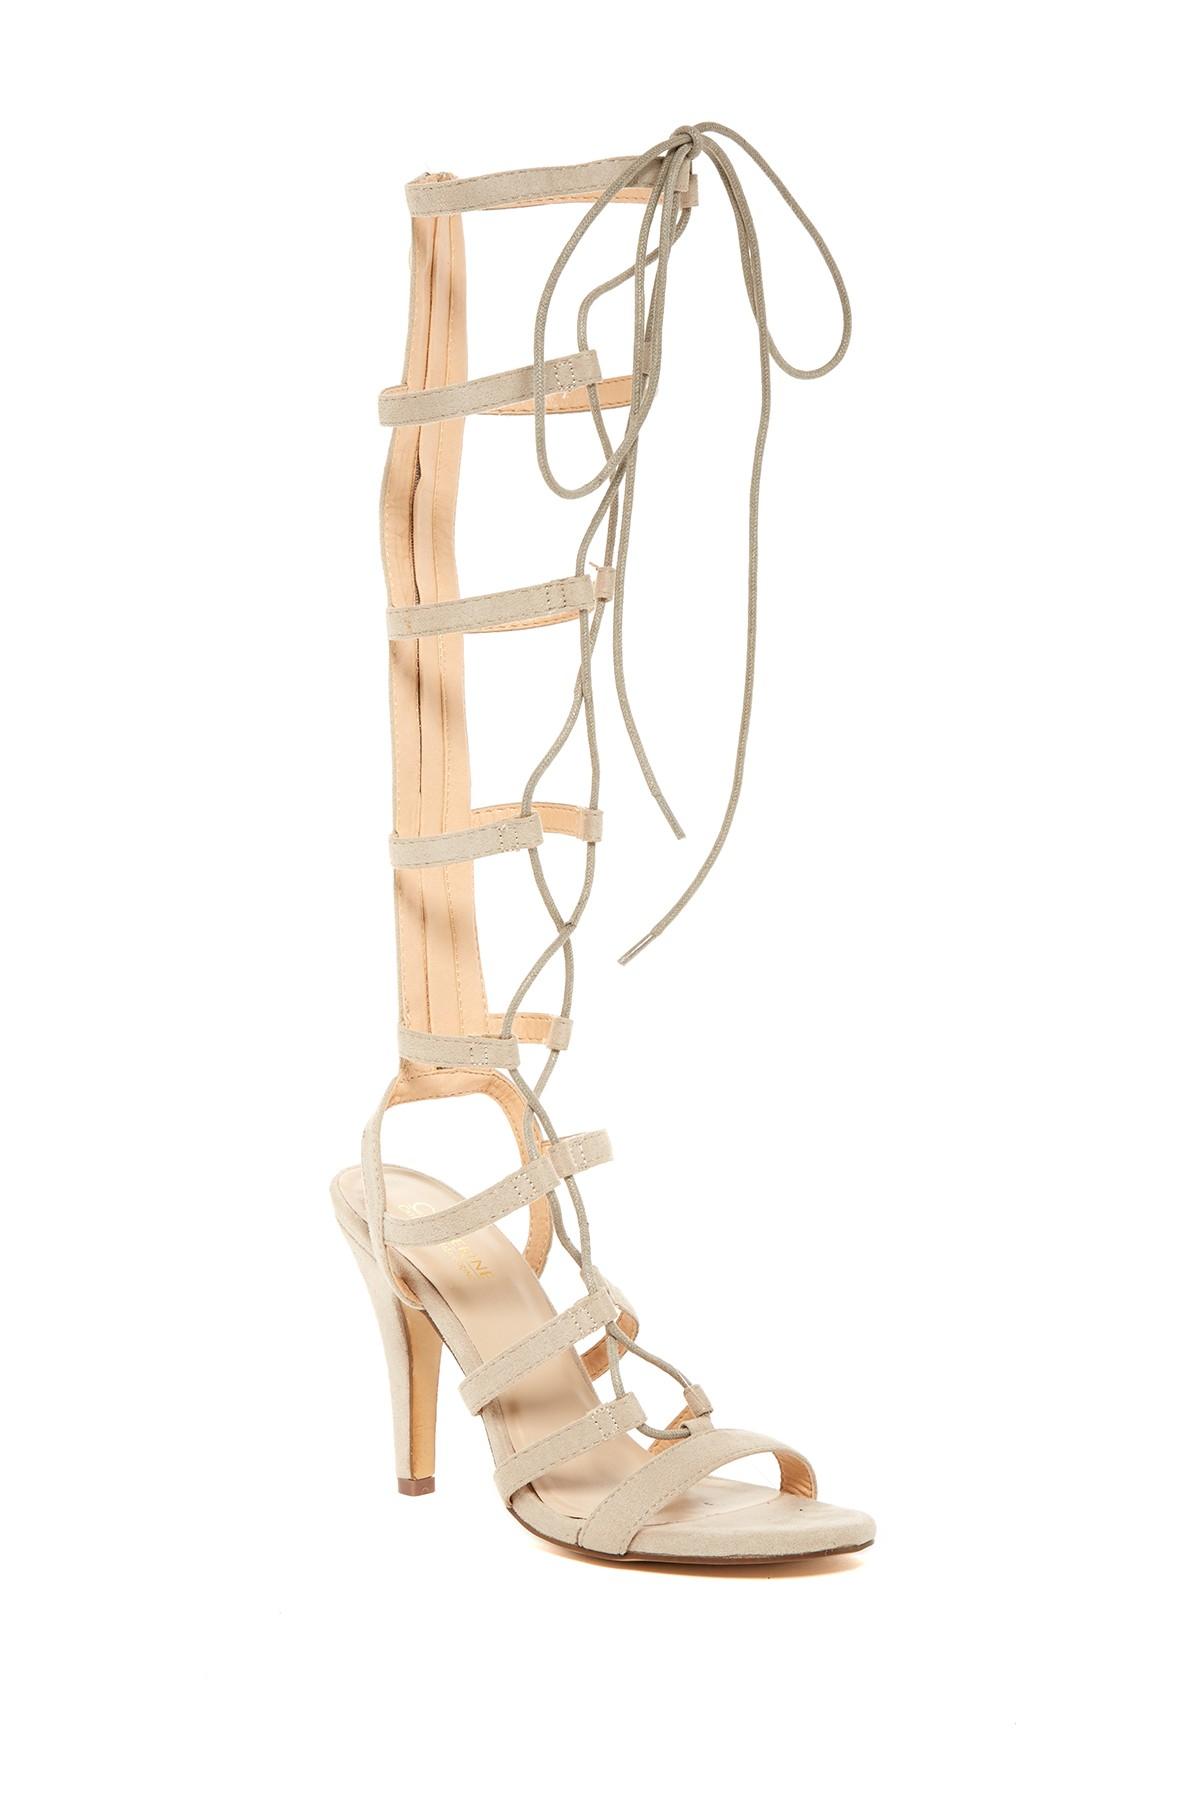 Lyst Catherine Malandrino Toyogie High Heel Gladiator